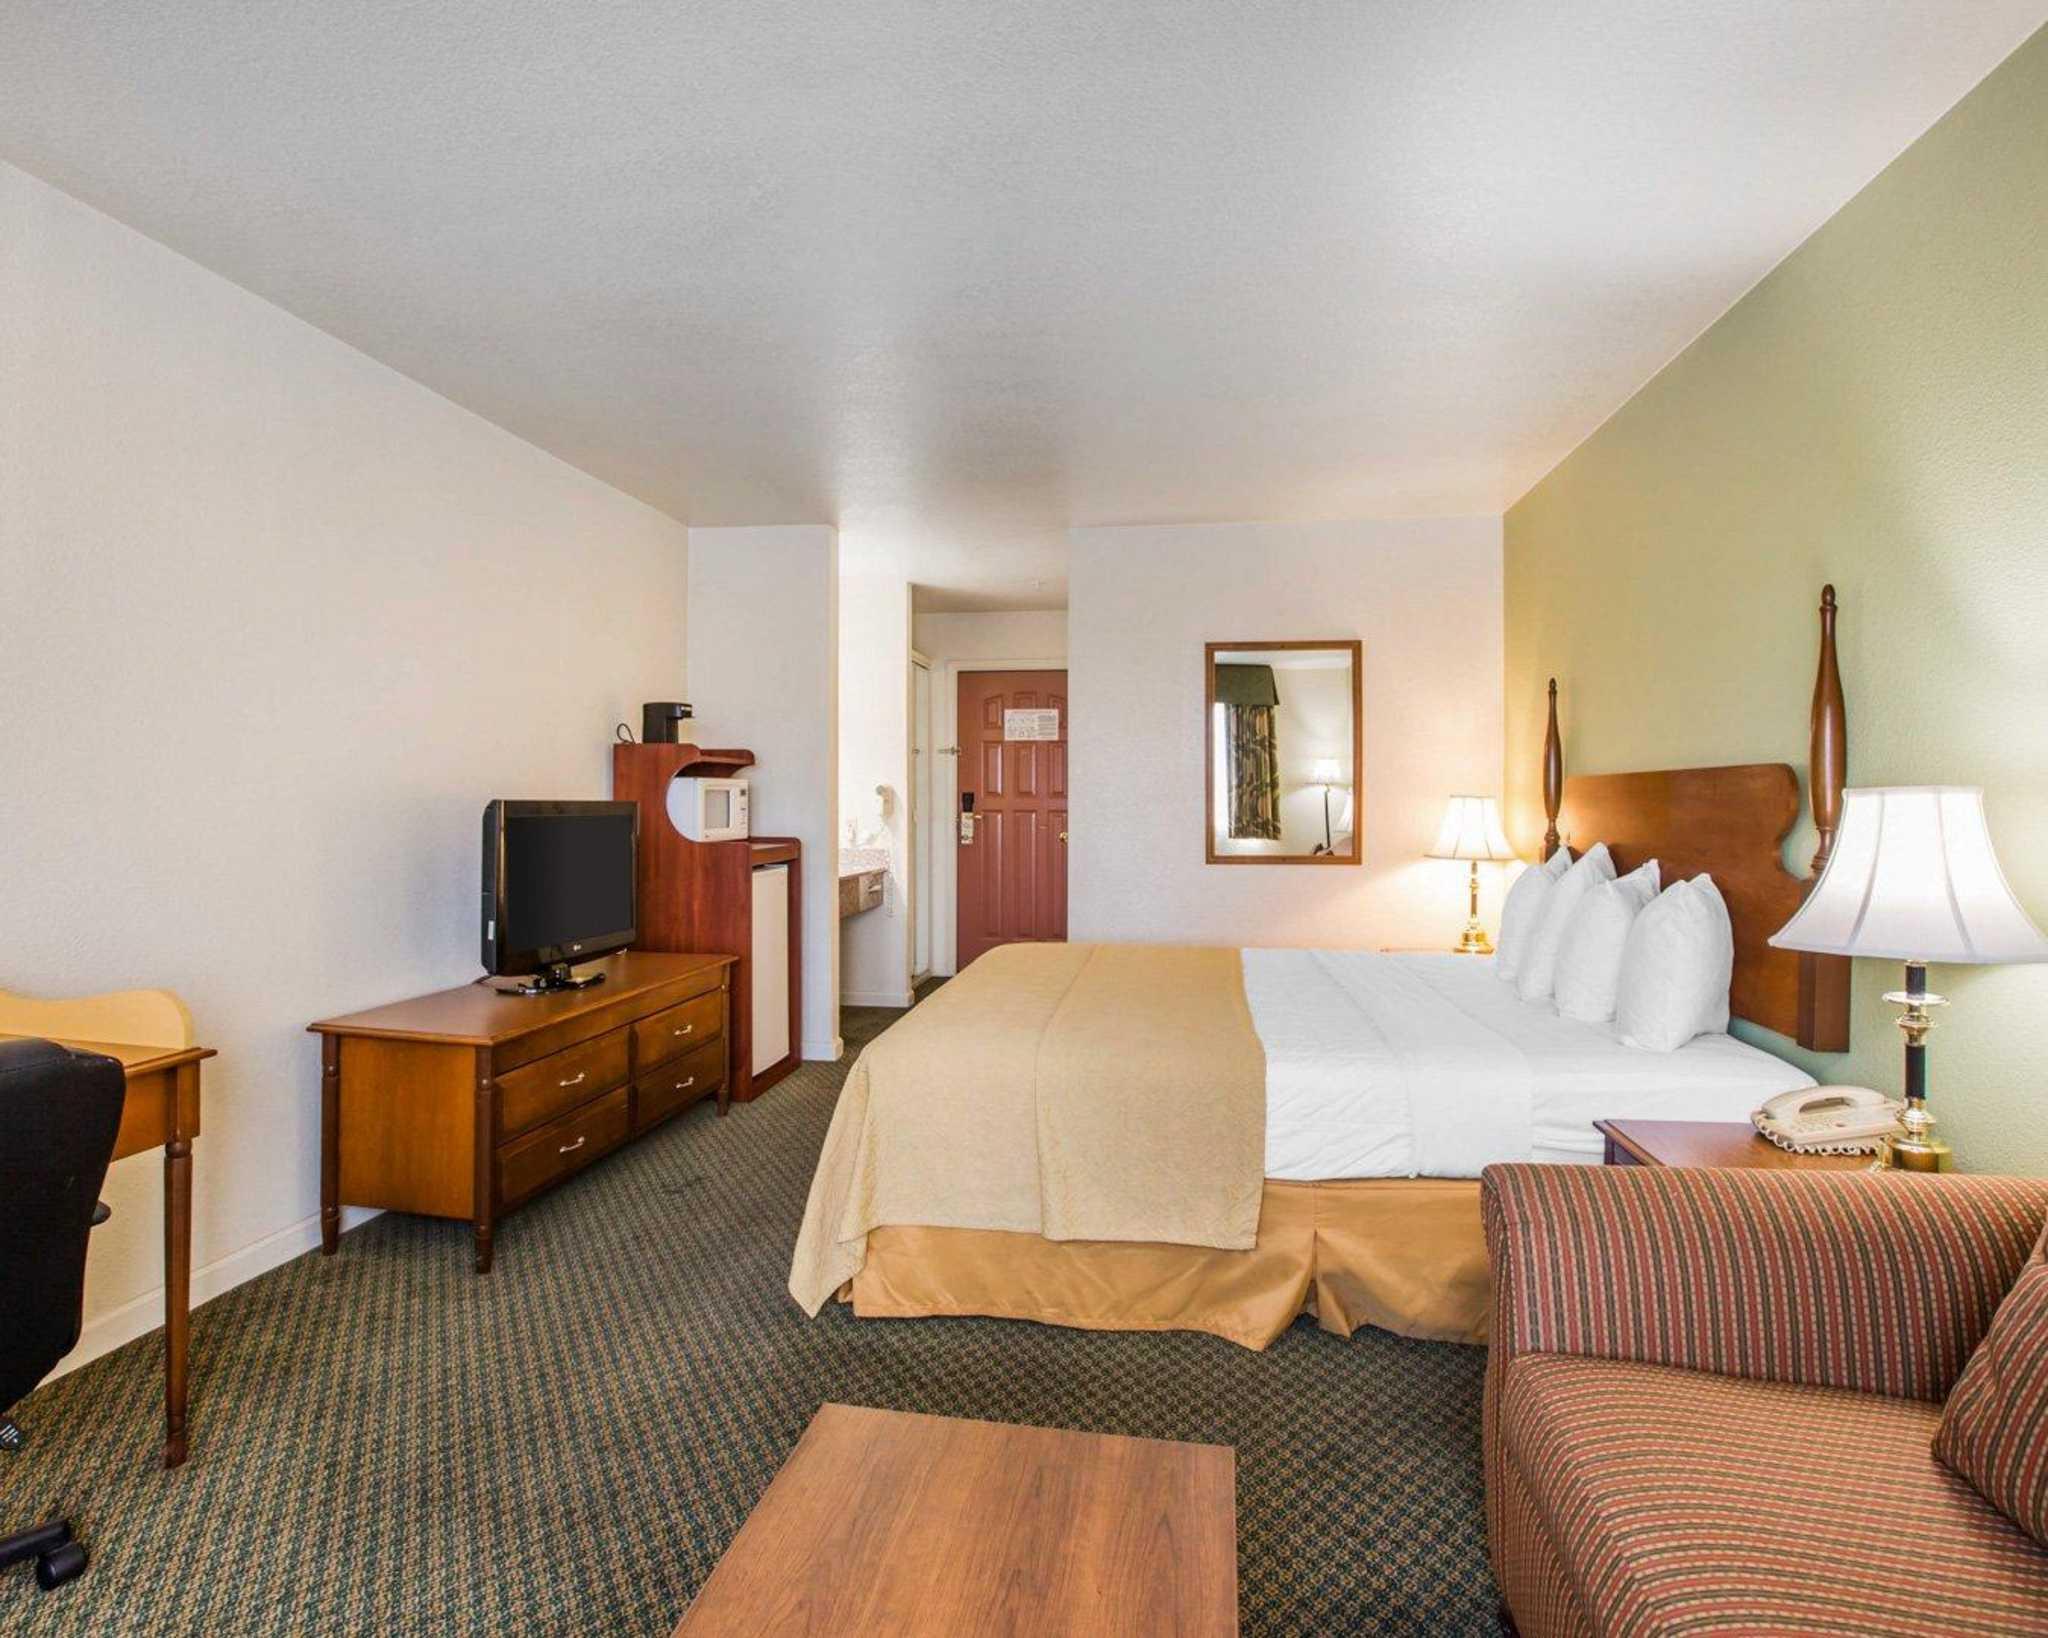 Quality Inn image 9